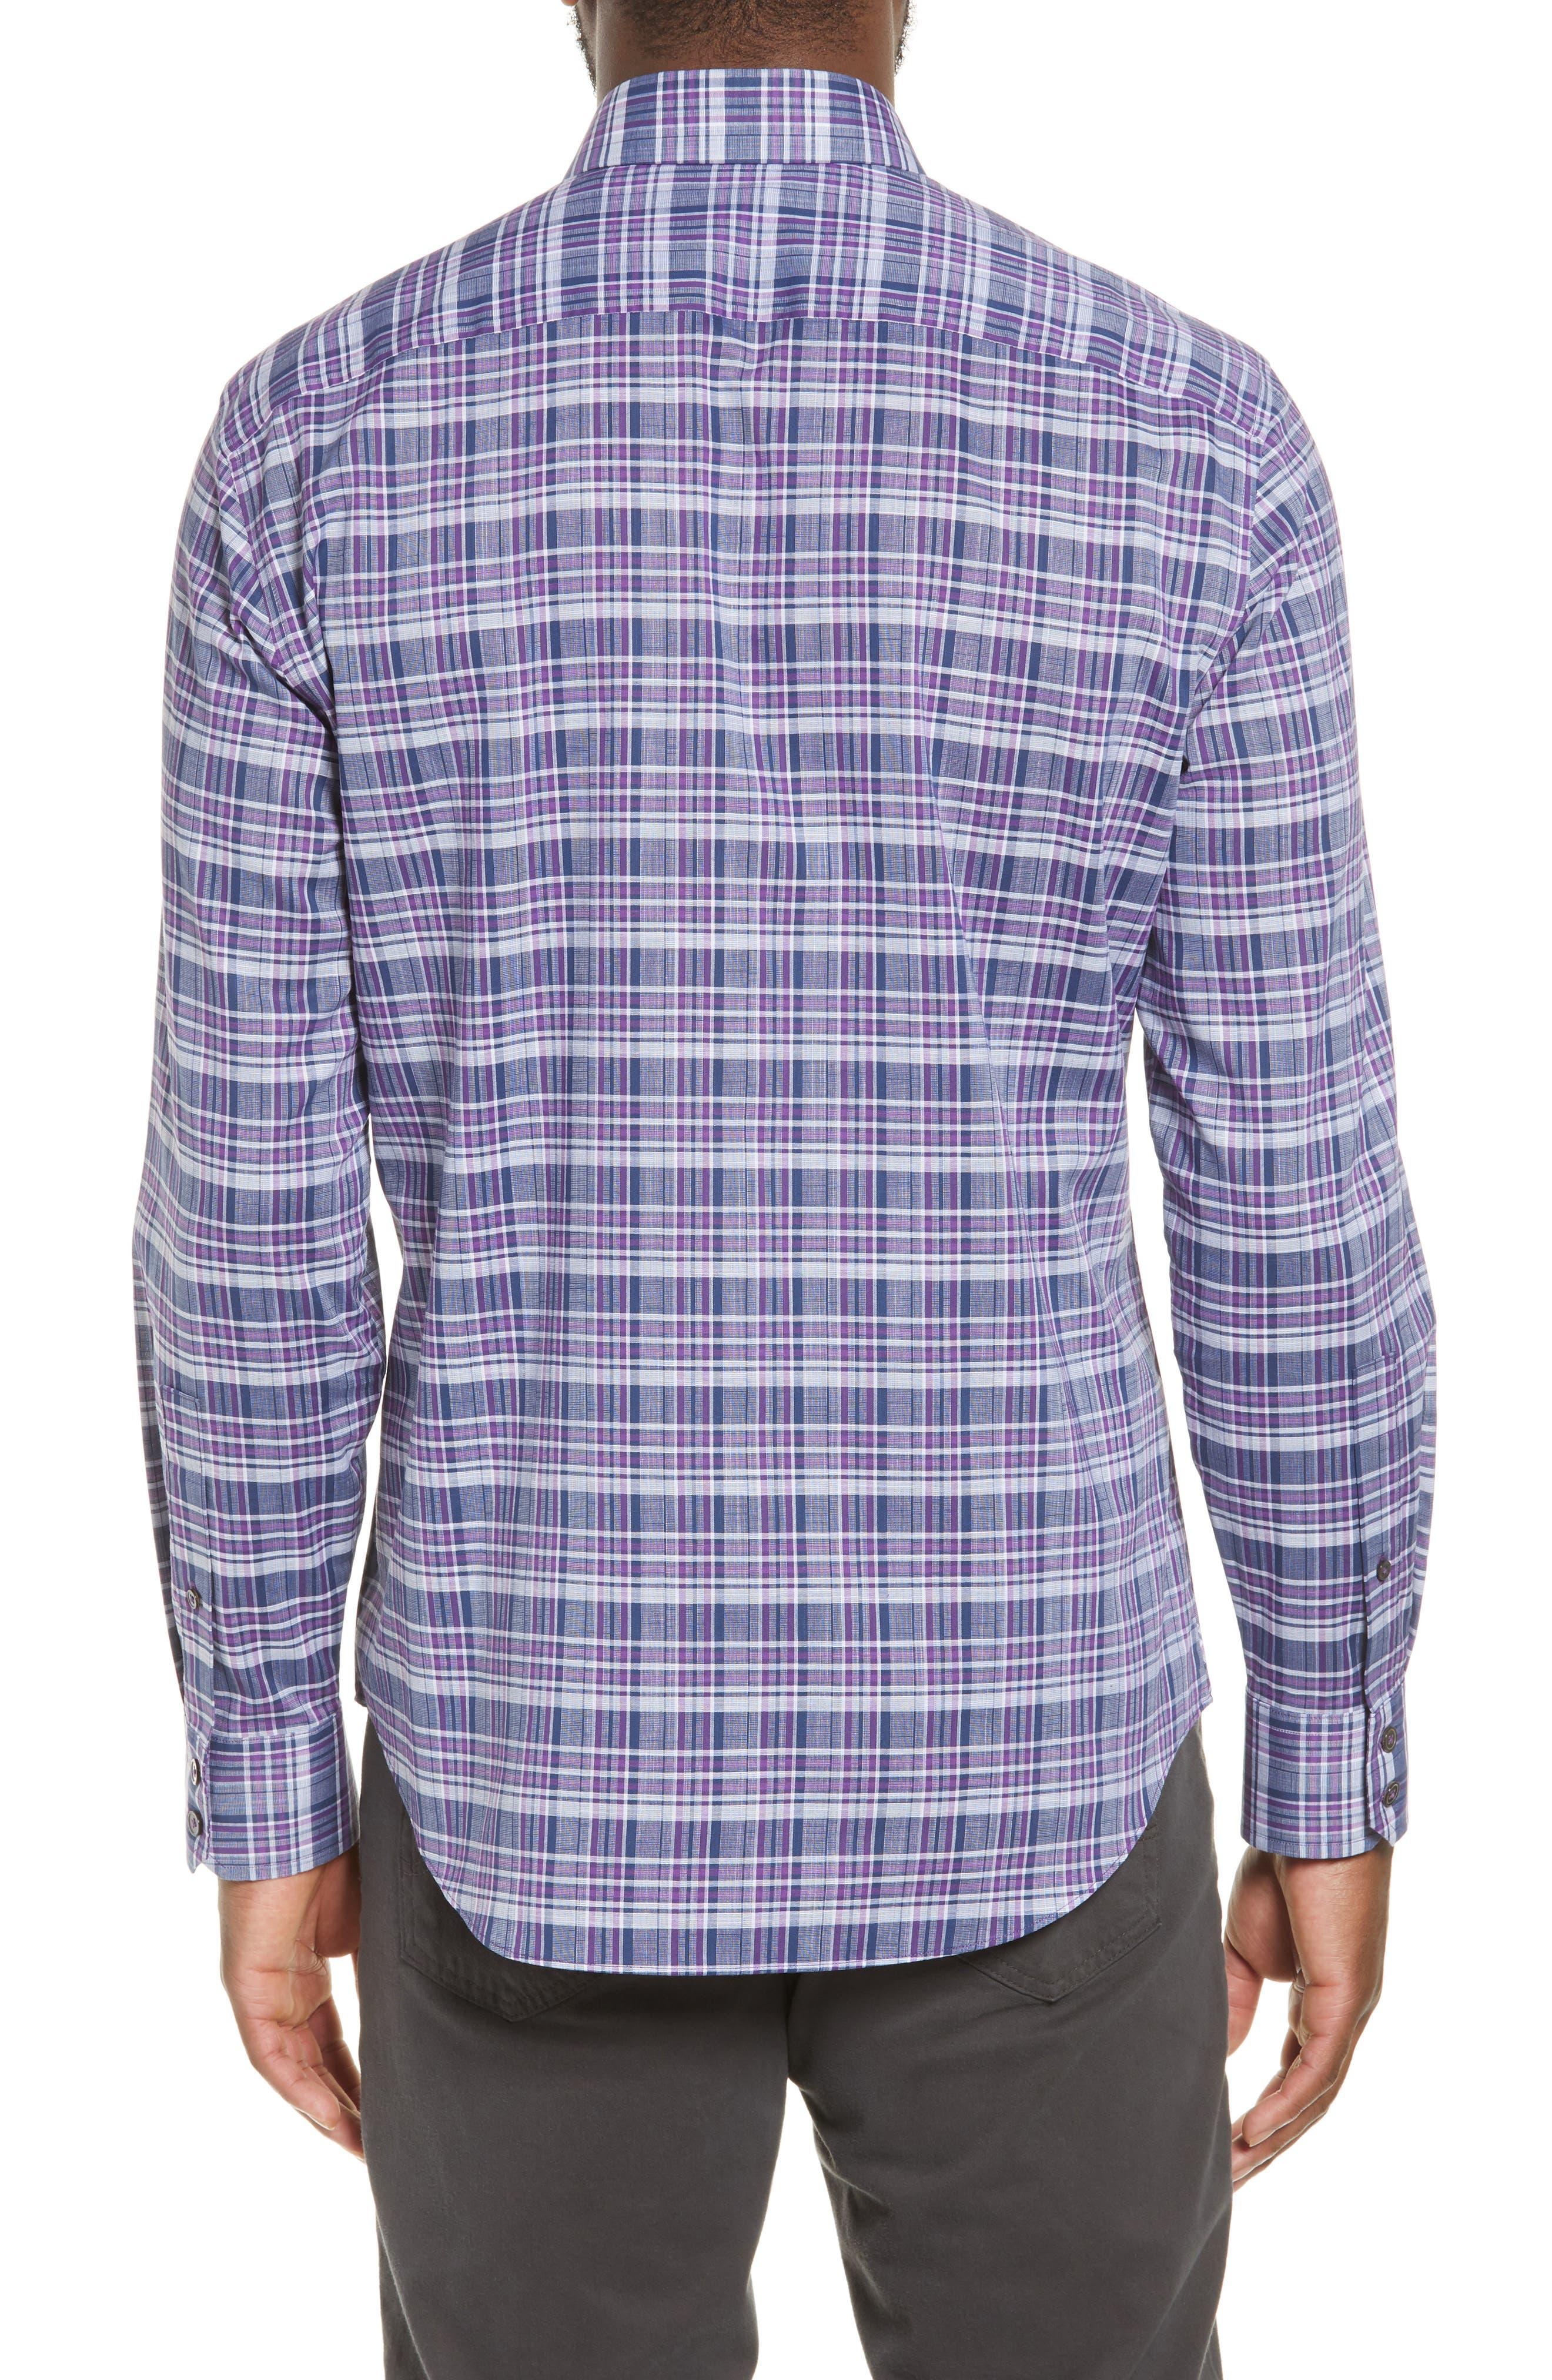 ZACHARY PRELL, Caro Regular Fit Sport Shirt, Alternate thumbnail 3, color, PURPLE